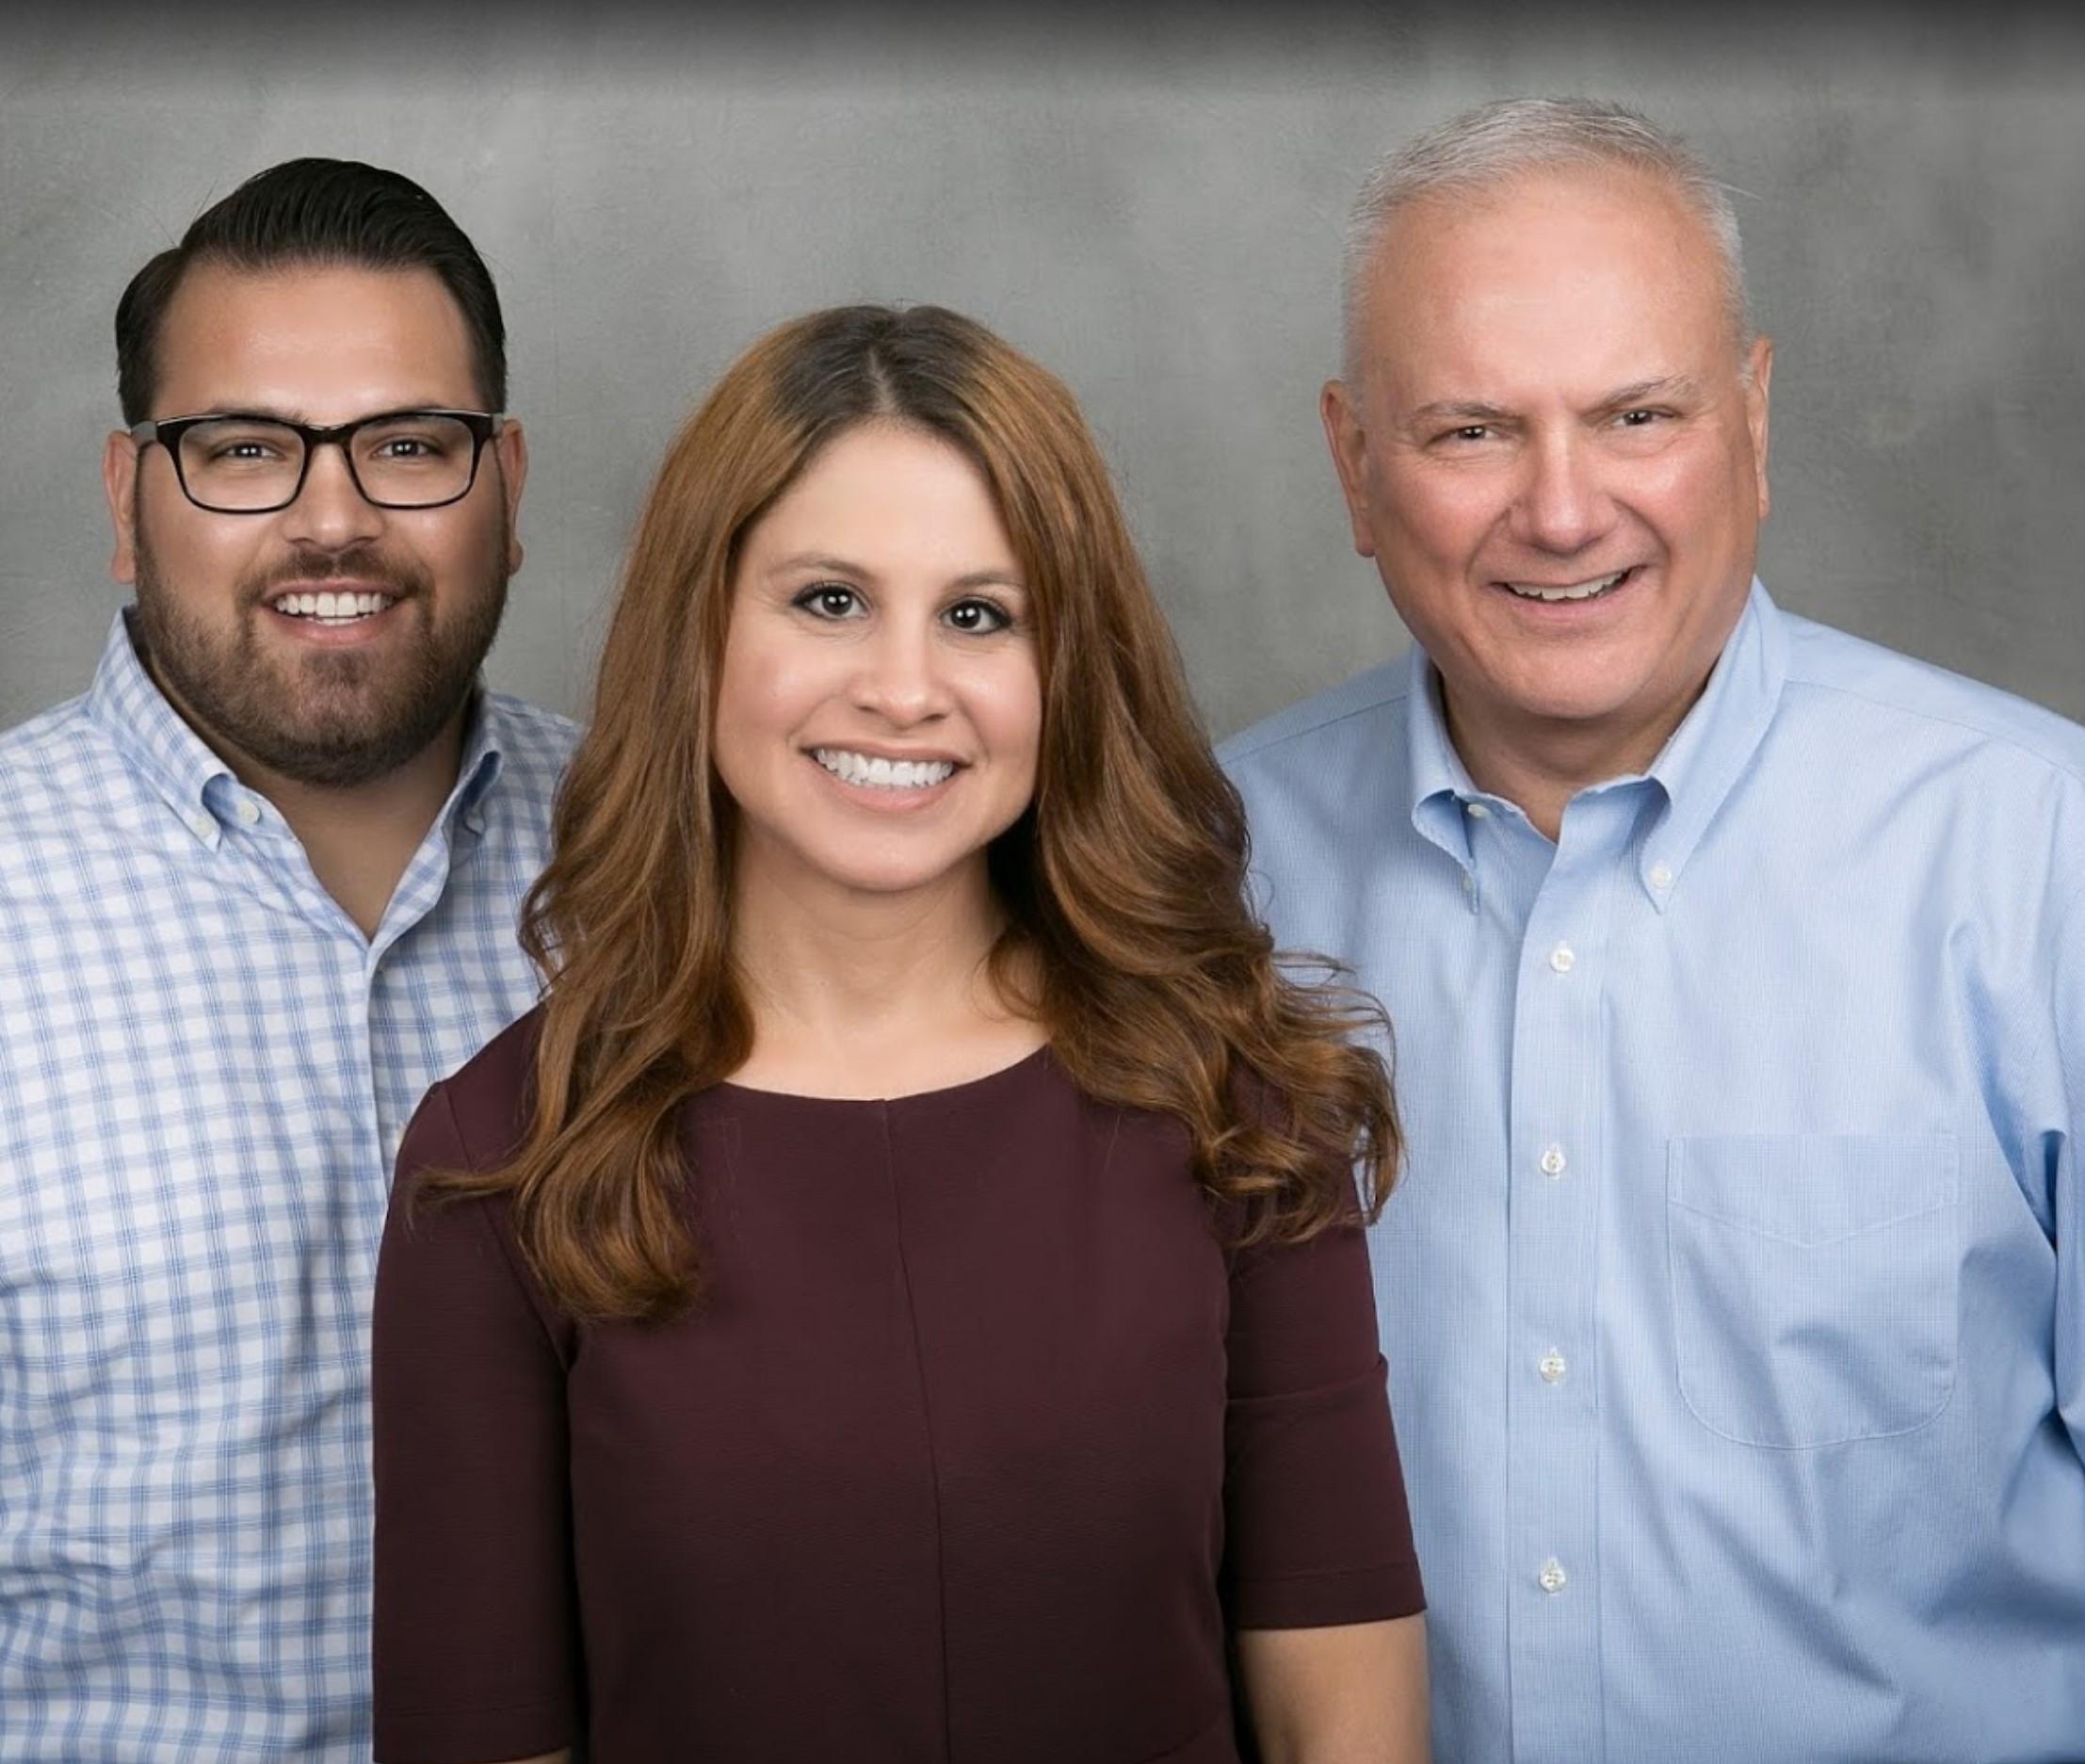 Photo of the Michael Brady & Co employees: Cameron Brady, Mercedez Hathcock, and Michael Brady